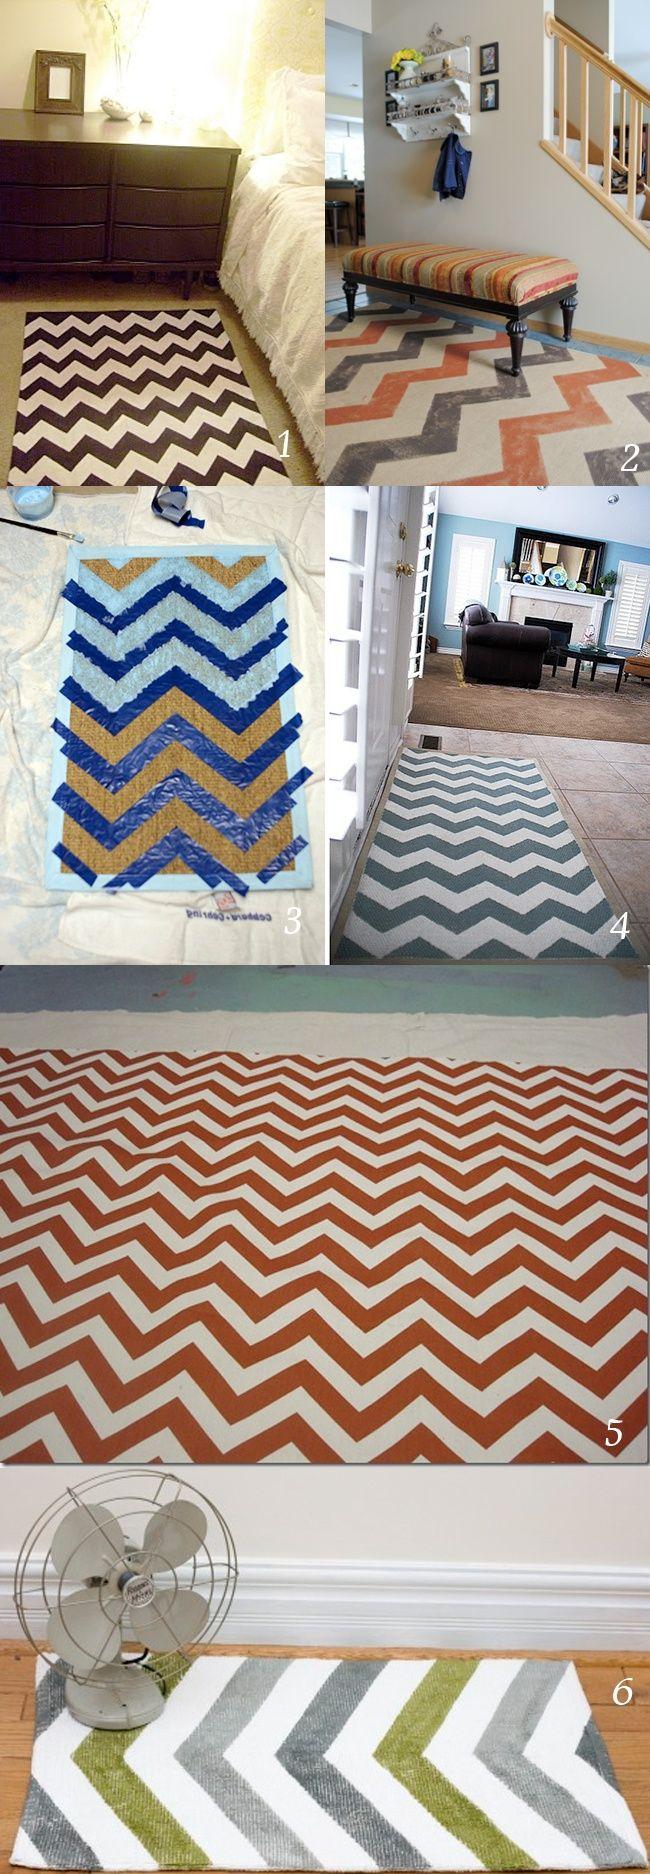 Make a DIY Chevron rugs out of a cheap plain rug or even ...